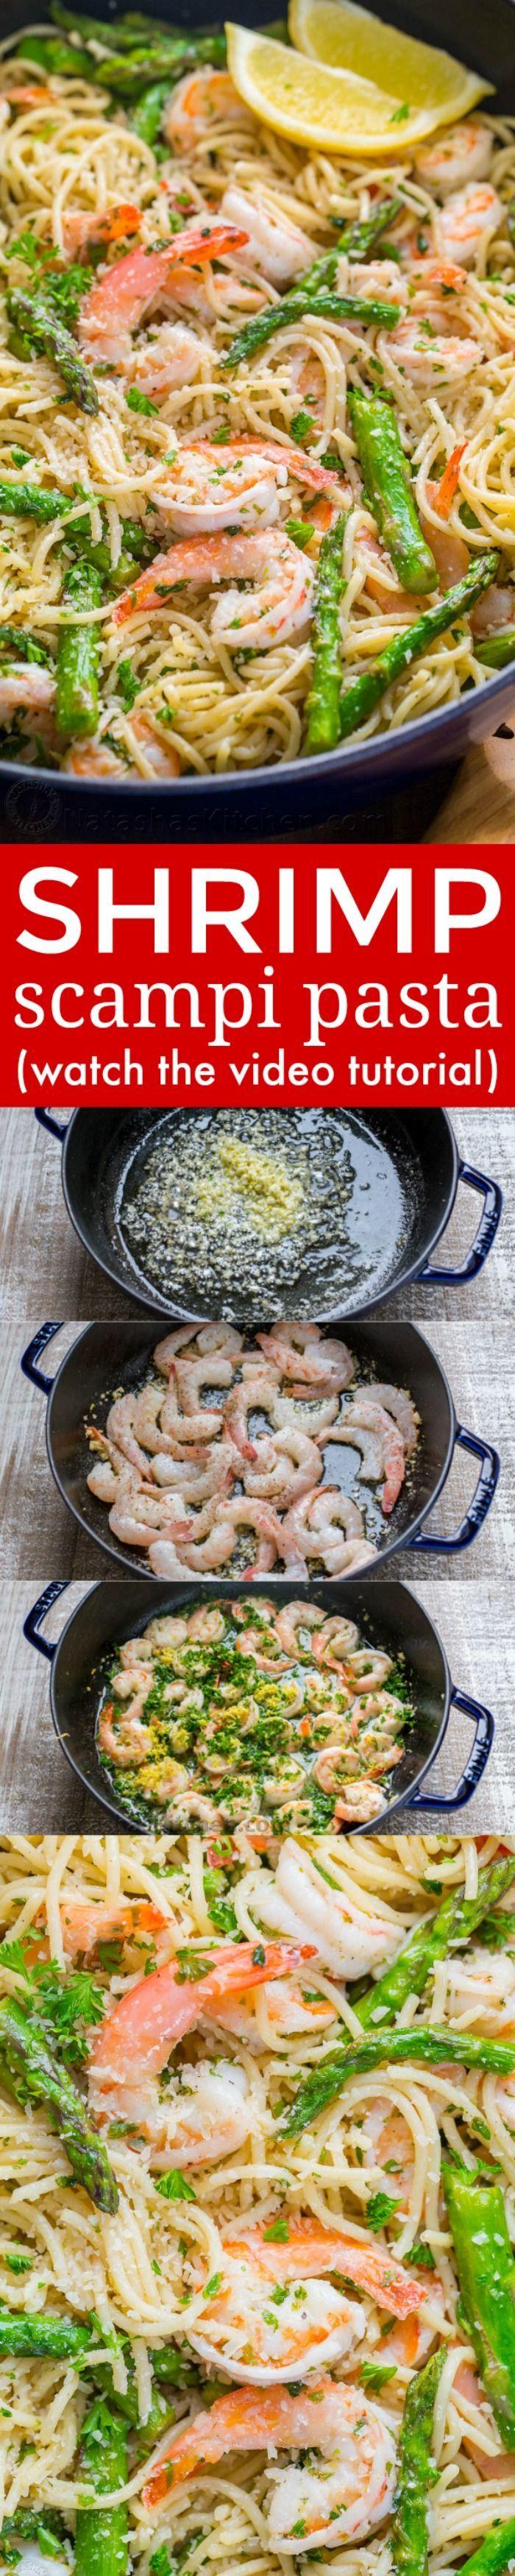 Shrimp Scampi Pasta with Asparagus (VIDEO) – NatashasKitchen.com